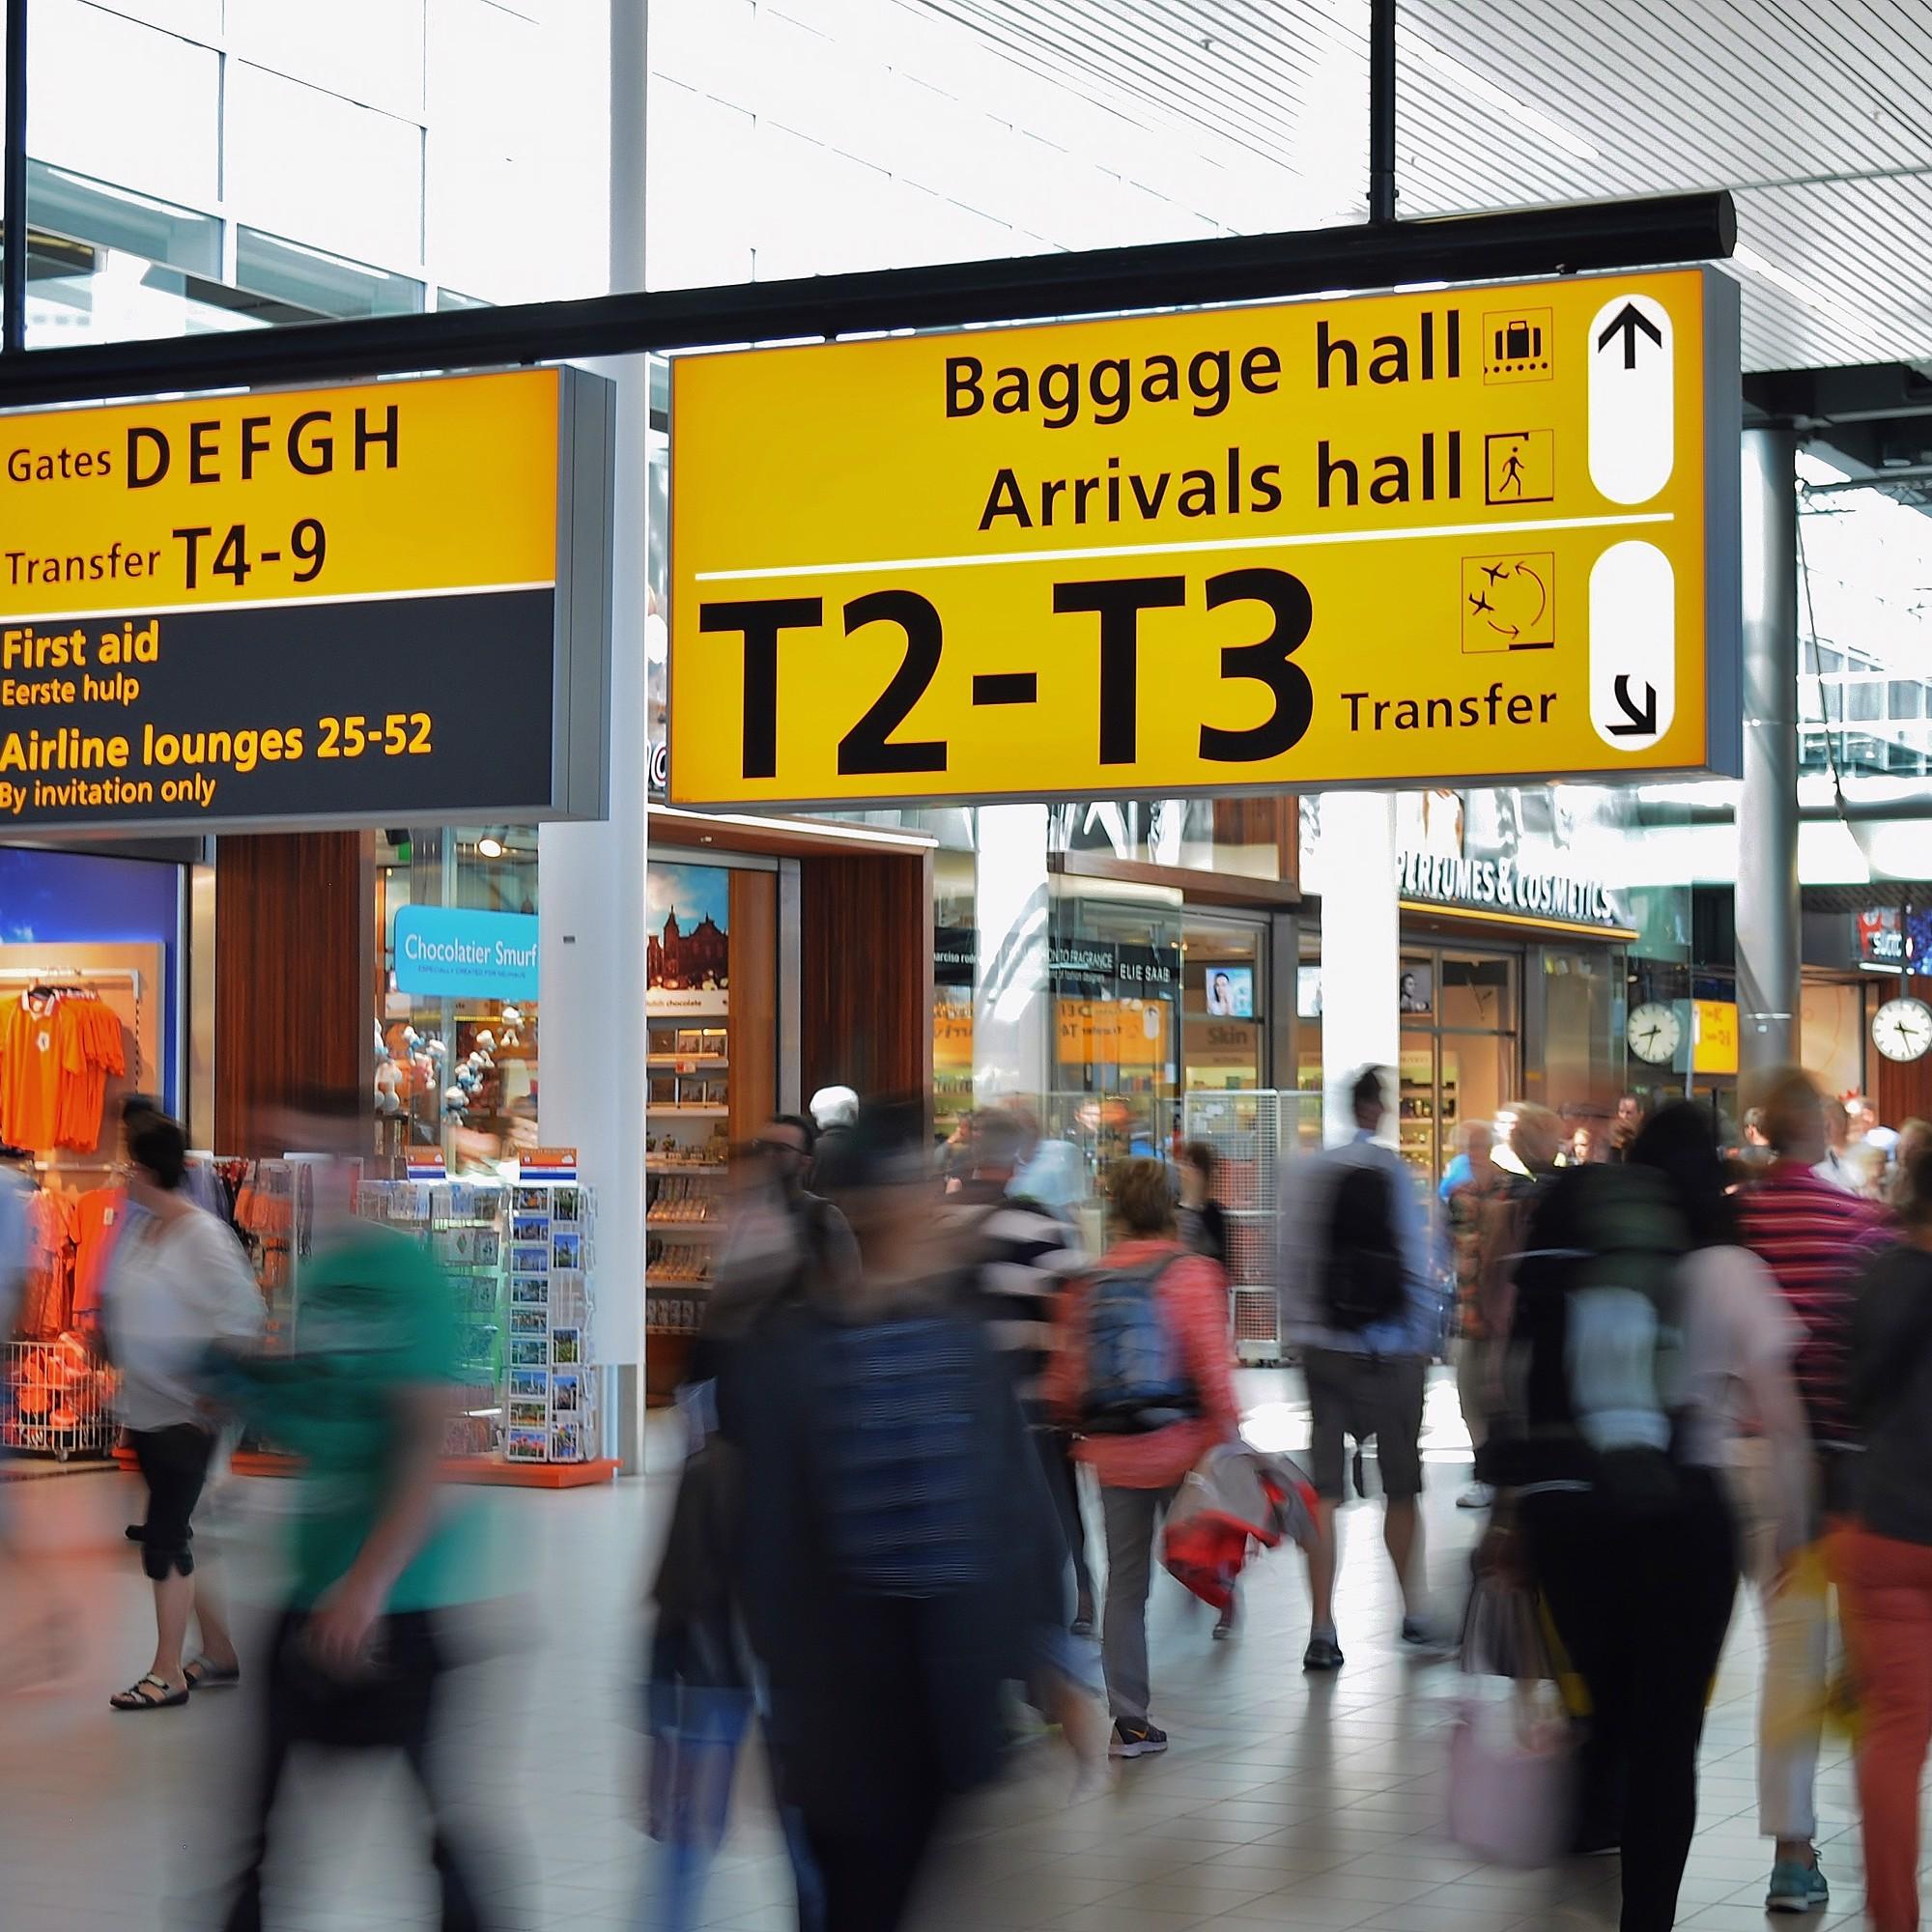 Gate am Flughafen